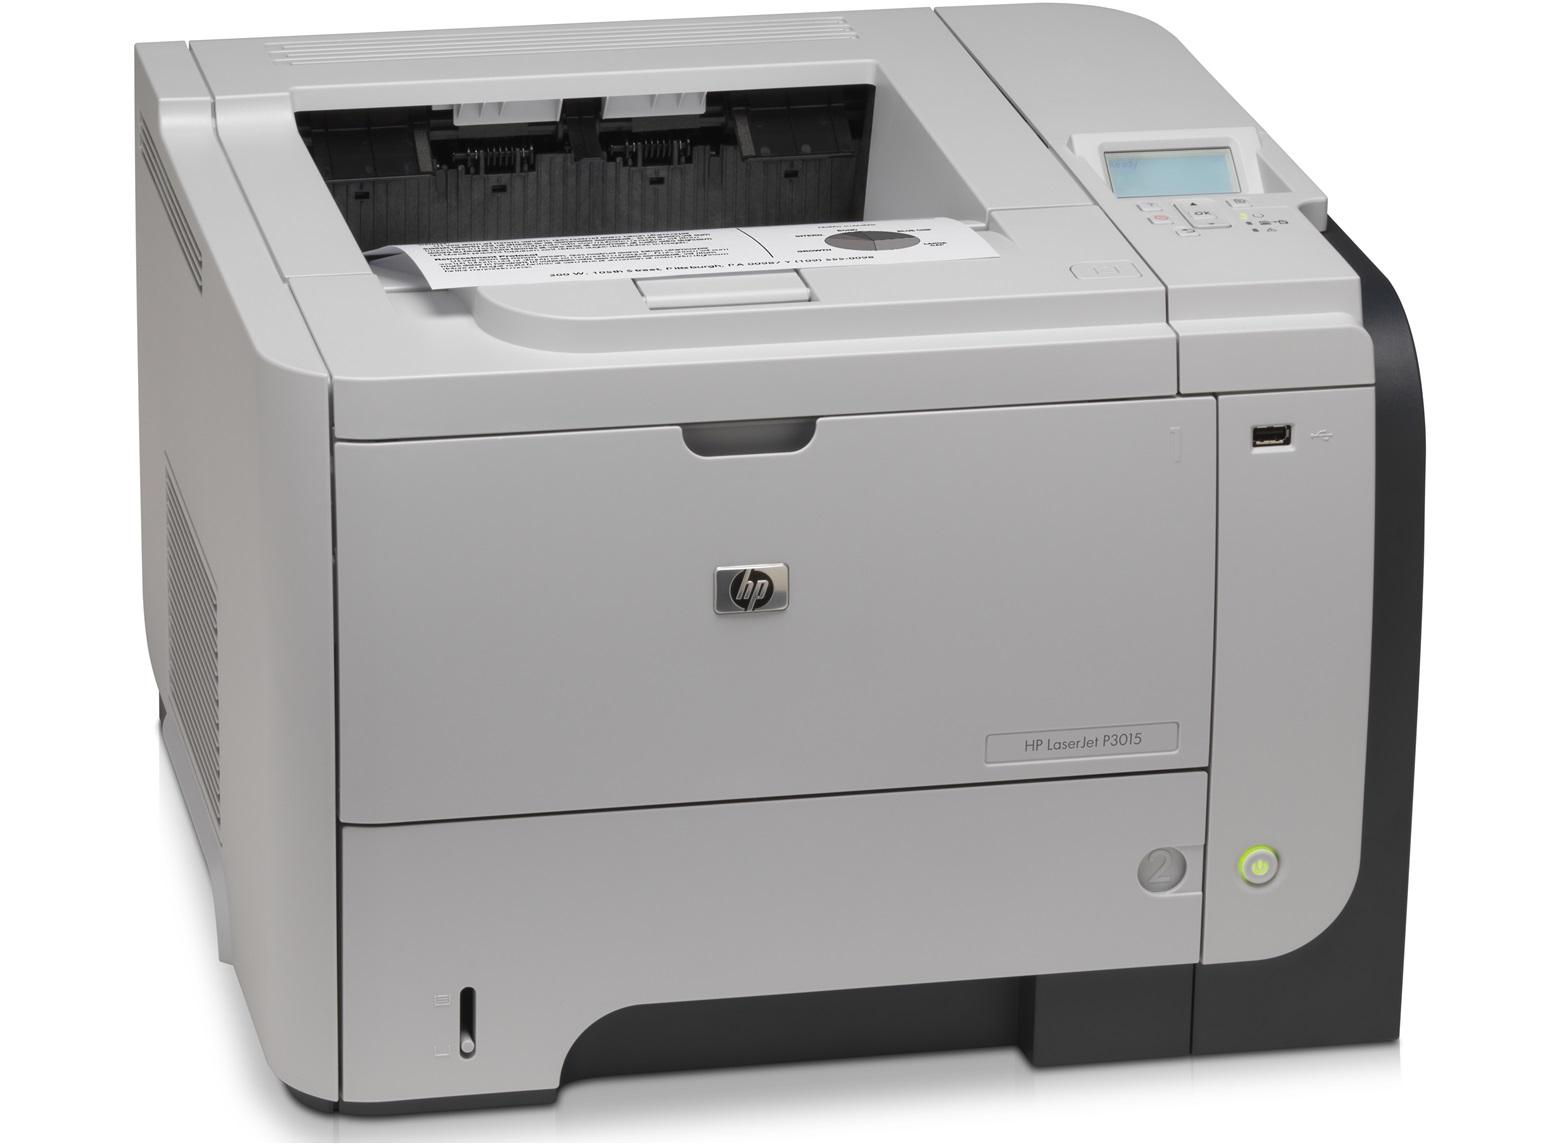 hp p3015n laserjet printer reconditioned copyfaxes rh copyfaxes com hp 2015 printer manual hp 2015 printer manual